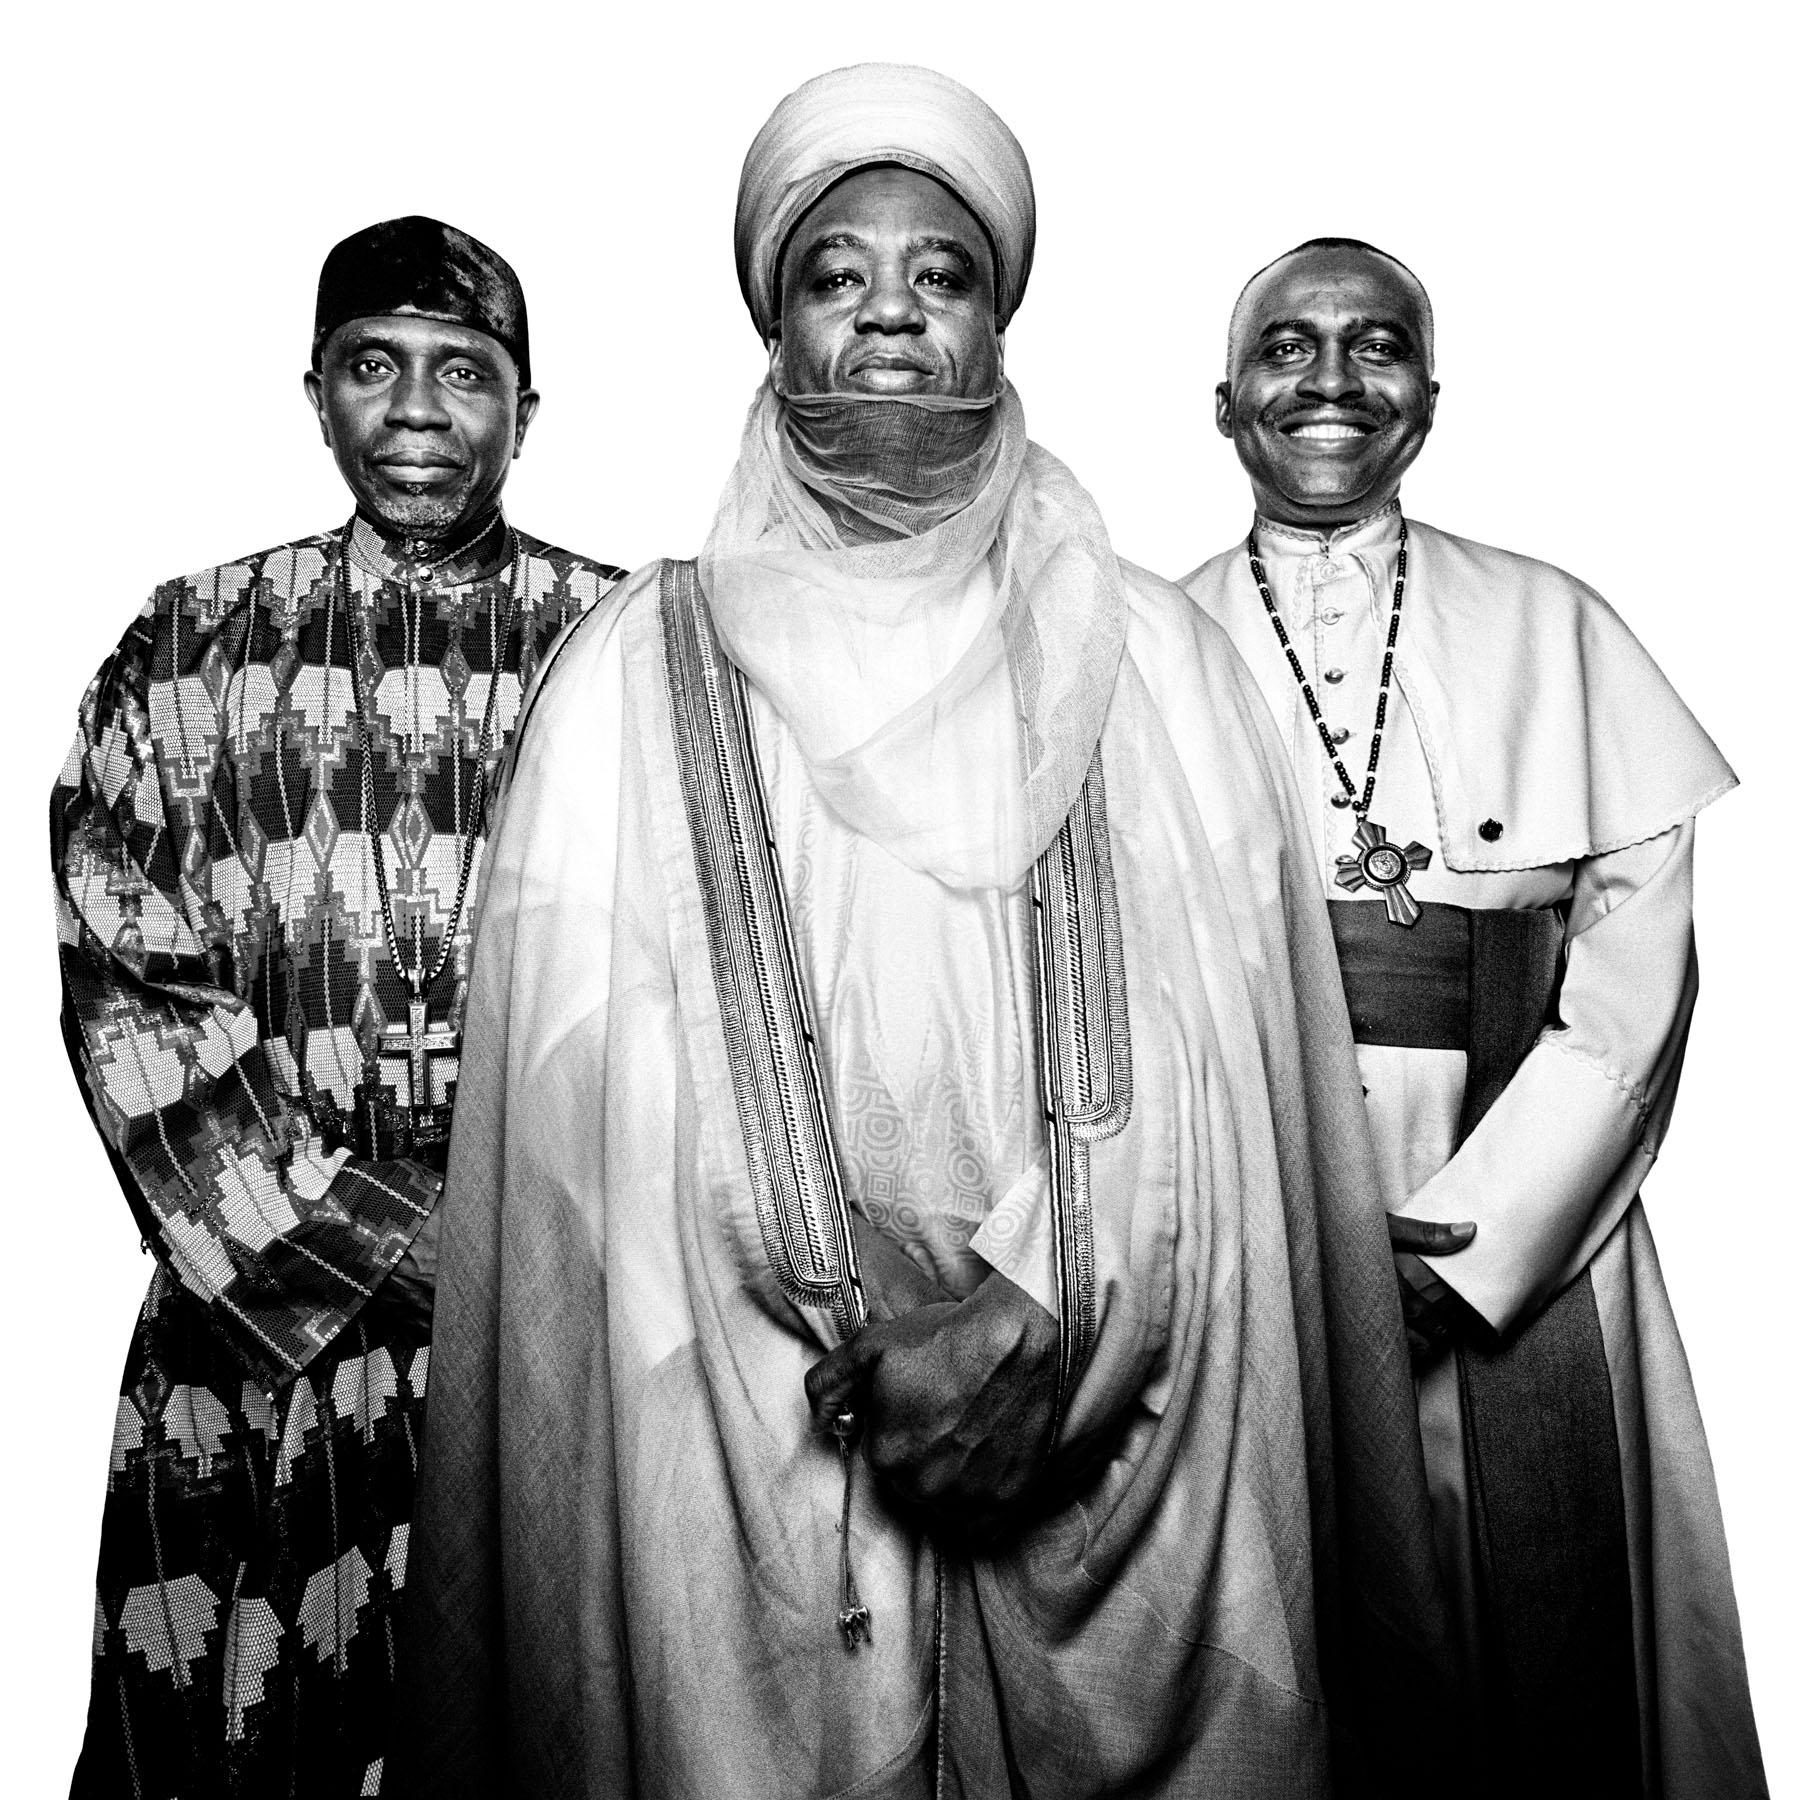 Nigerian Inter-Faith Action Association